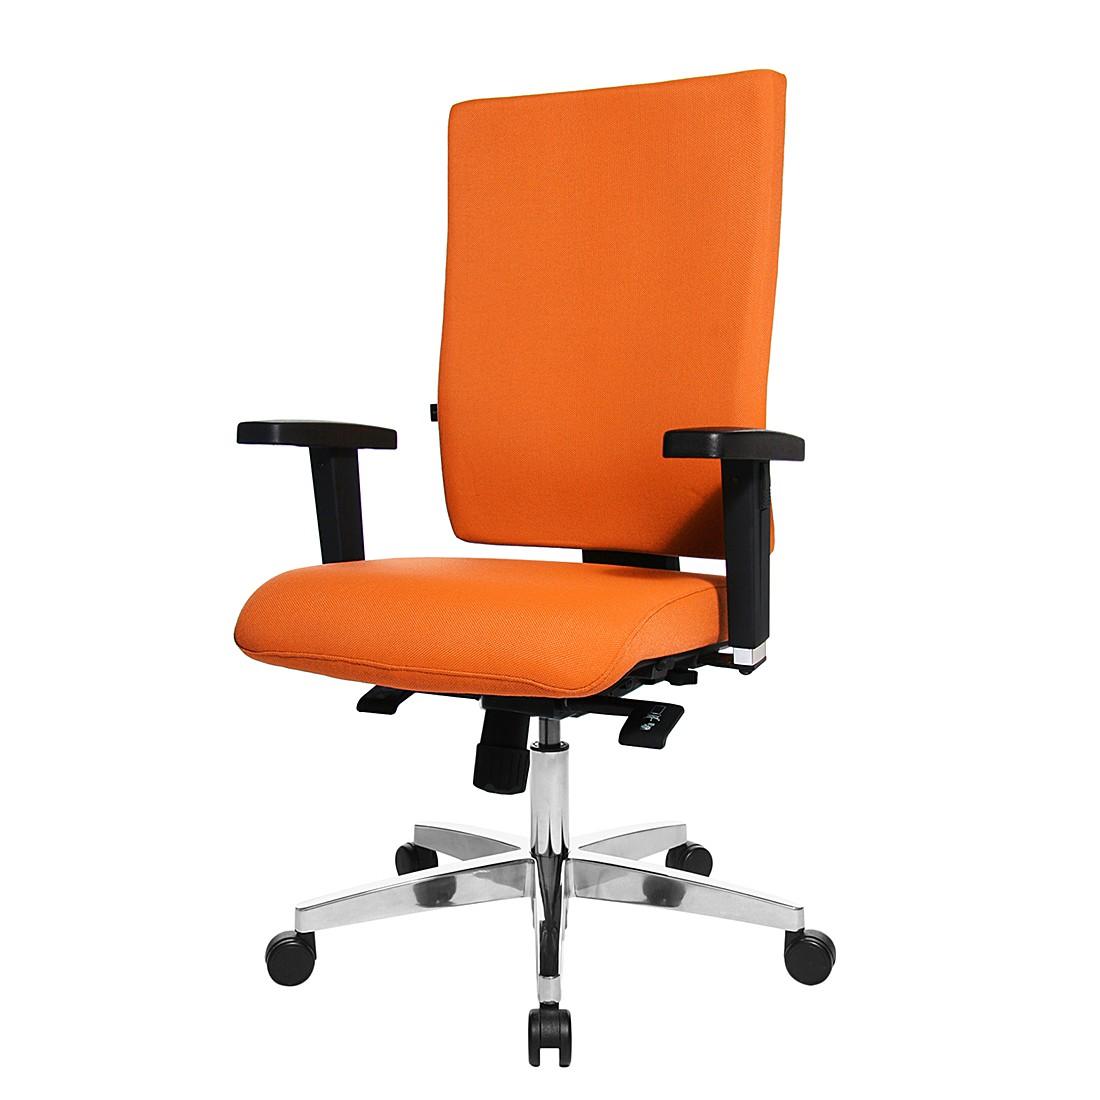 Bürodrehstuhl Lightstar 20 - Mit Armlehnen - Orange, Topstar